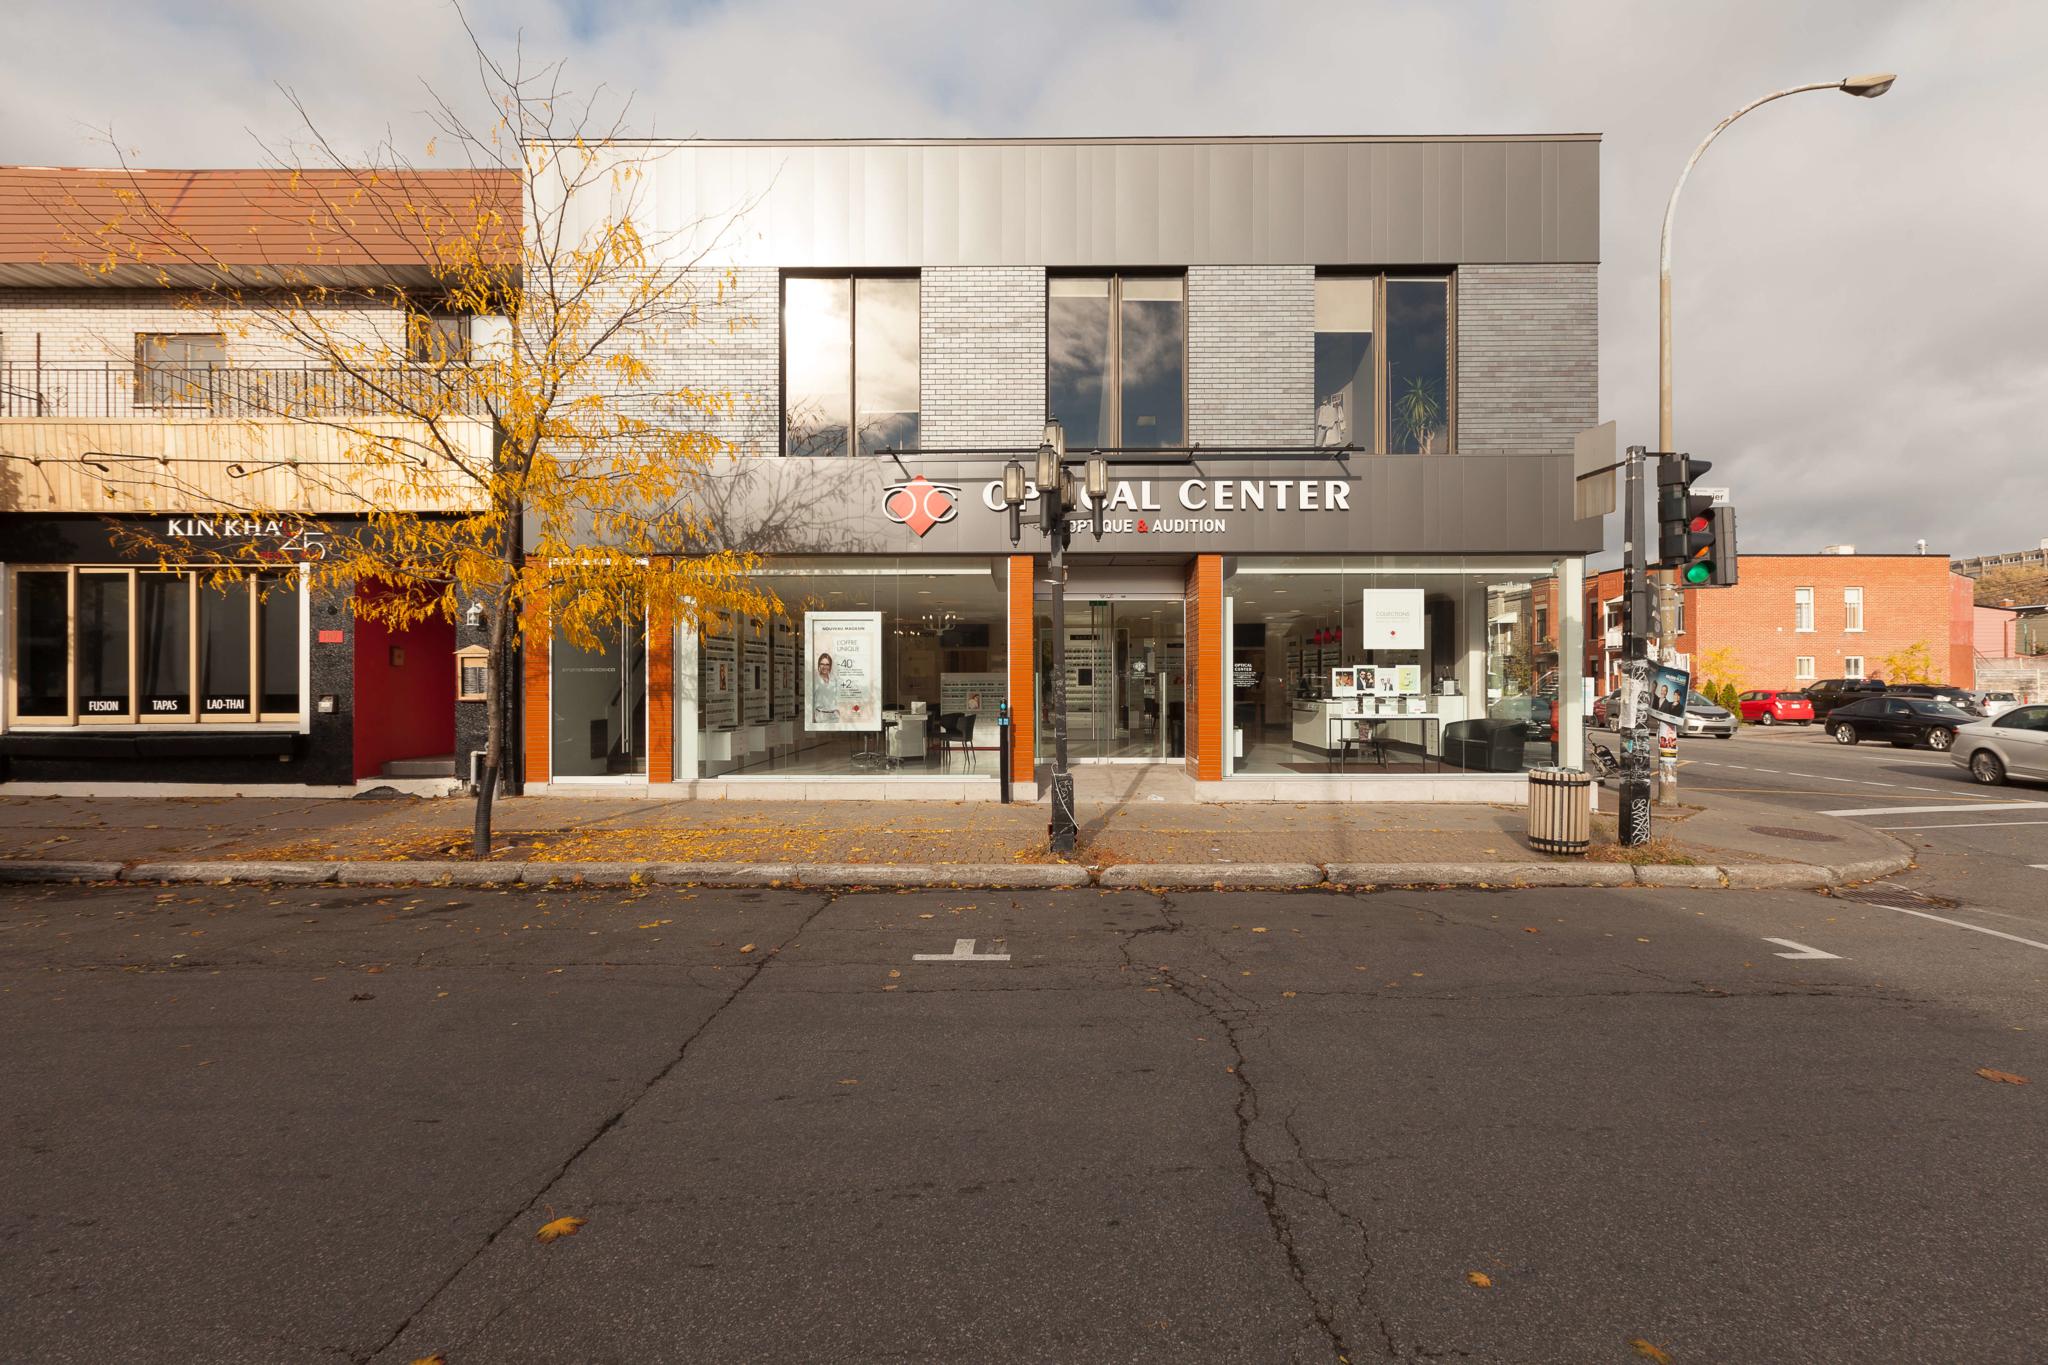 Optical Montreal D'ouverture Center Horaire Laurier Av 97 5Rjc4AqL3